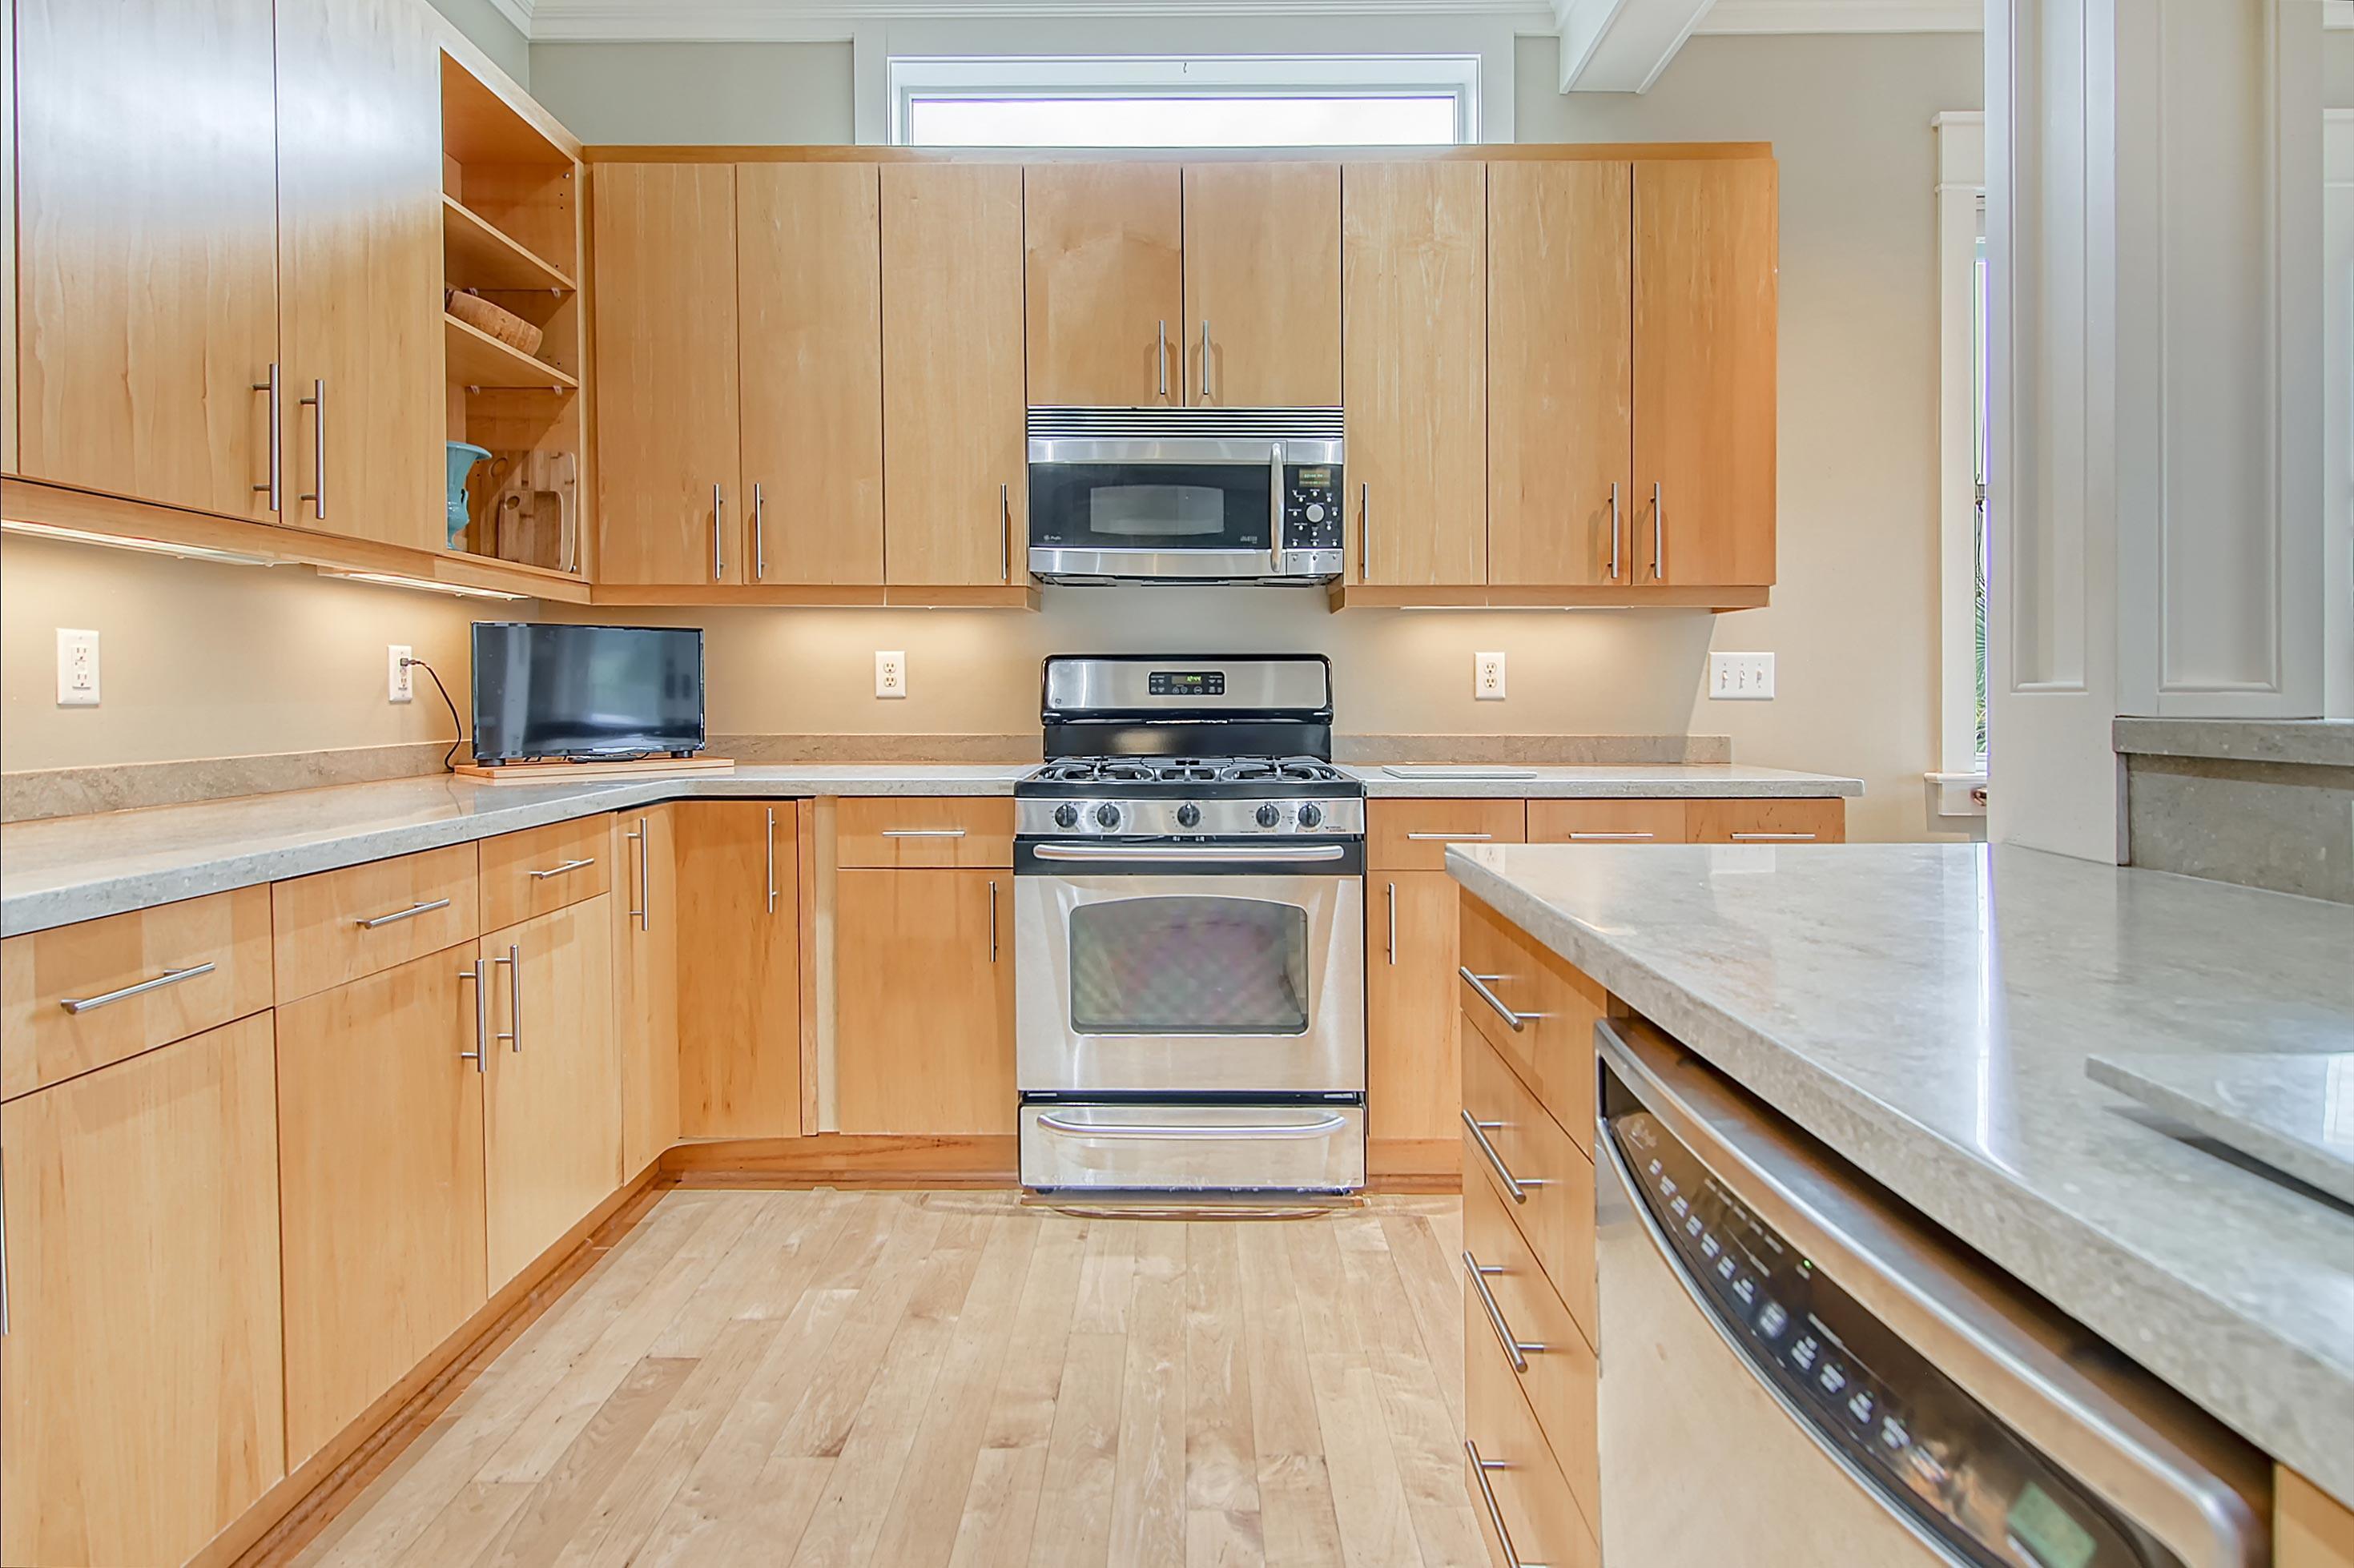 Scanlonville Homes For Sale - 152 6th, Mount Pleasant, SC - 1